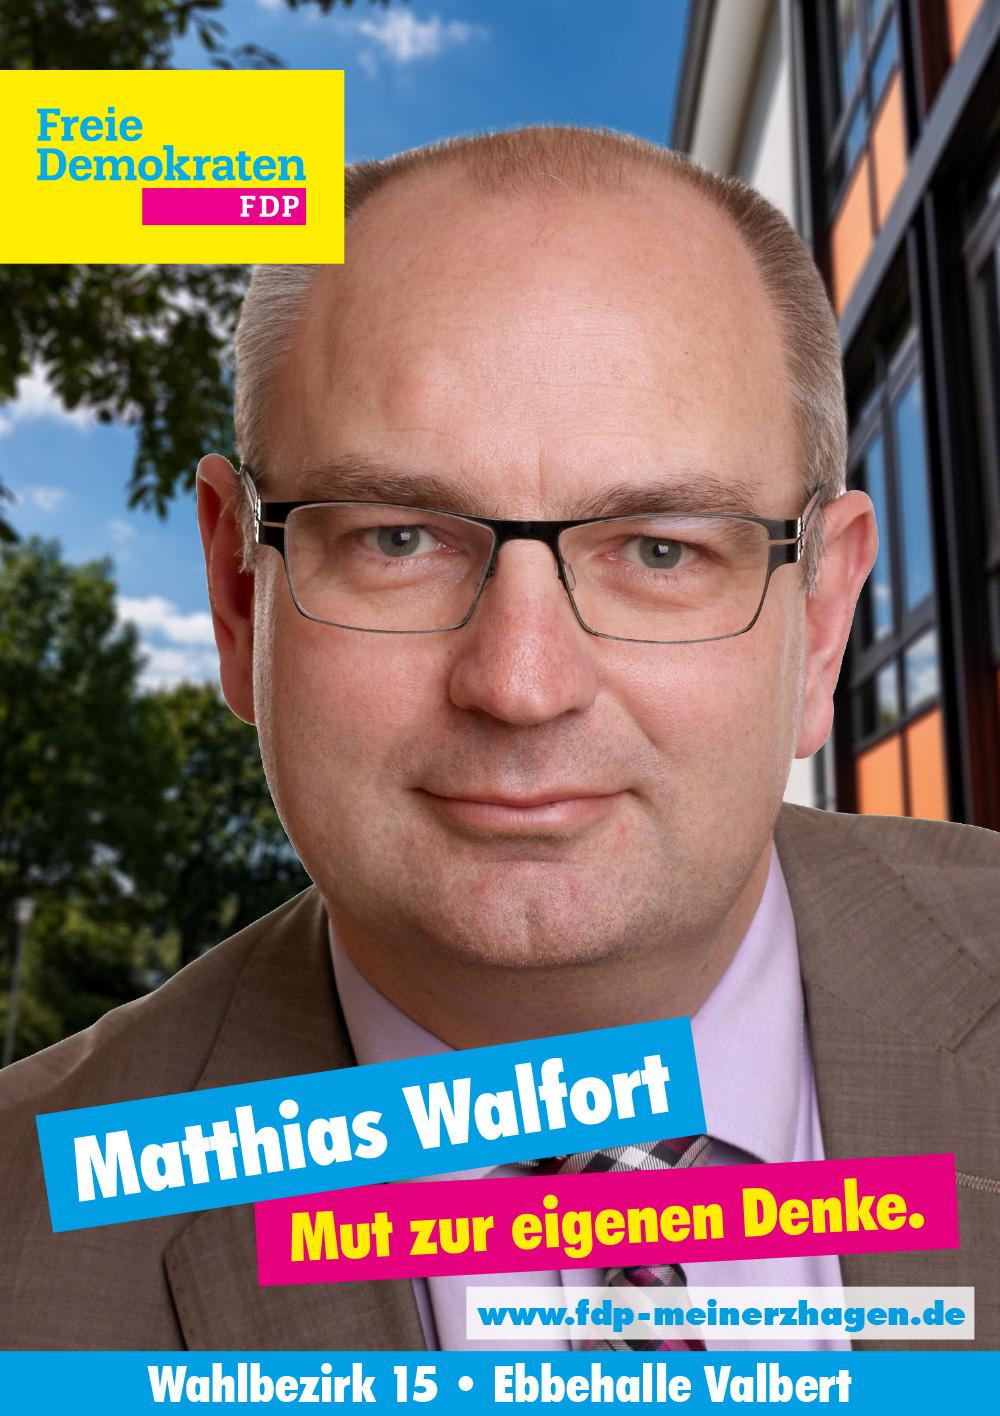 Wahlbezirk 15 - Matthias Walfort